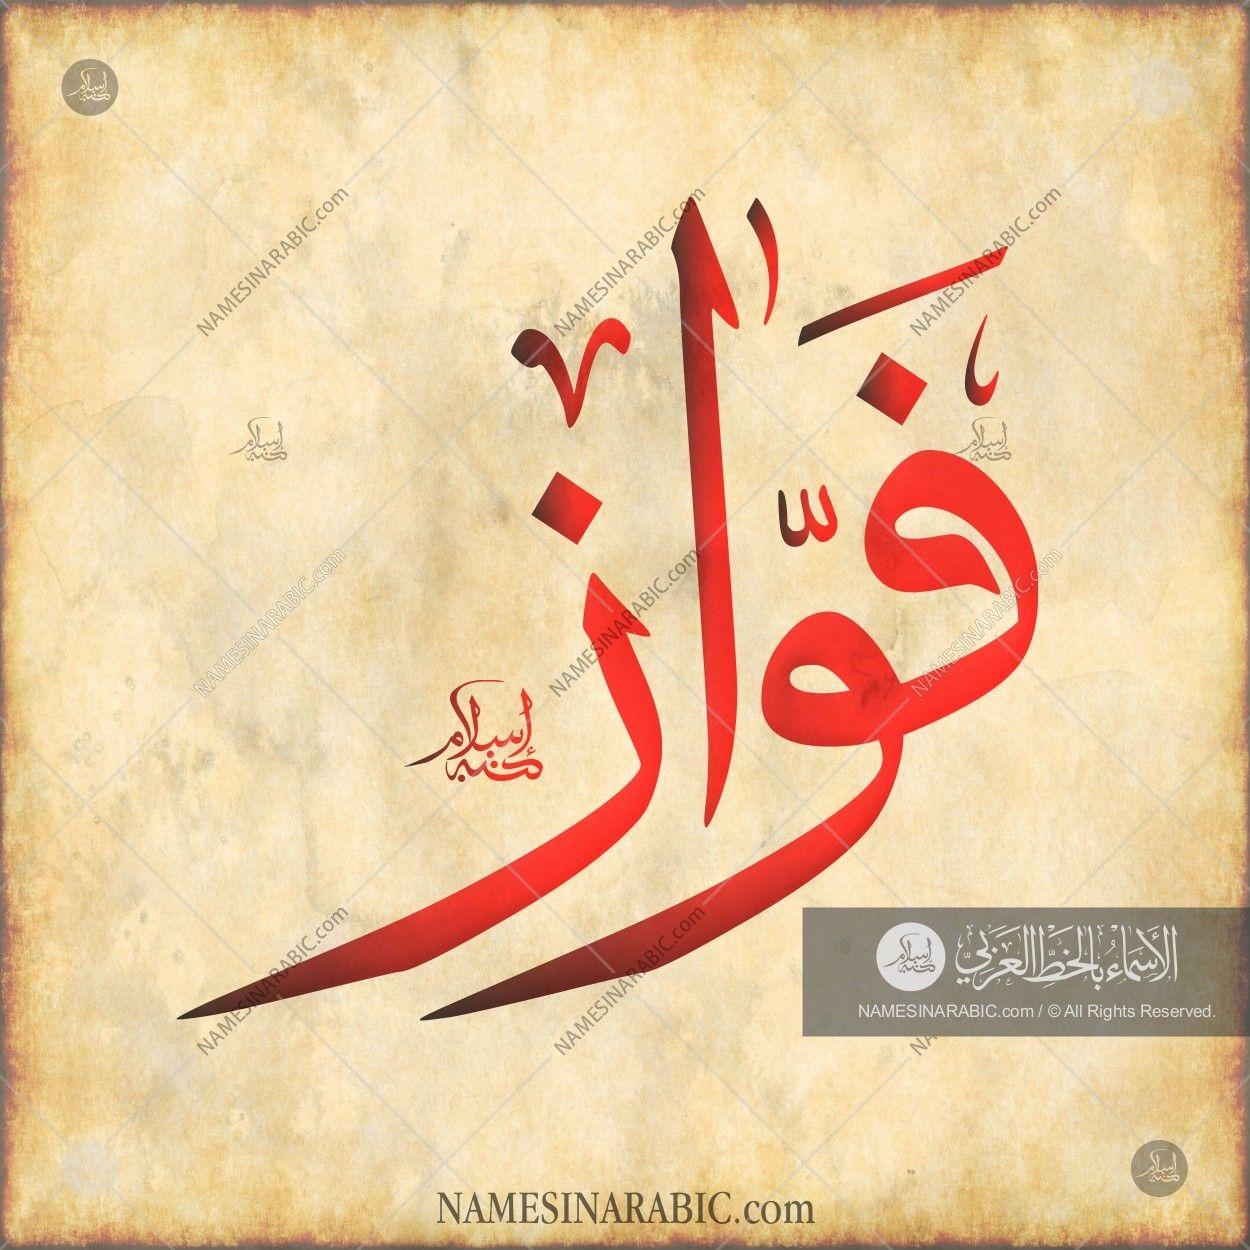 Fawwaz Name In Arabic Calligraphy Arabic Calligraphy Design Calligraphy Calligraphy Name